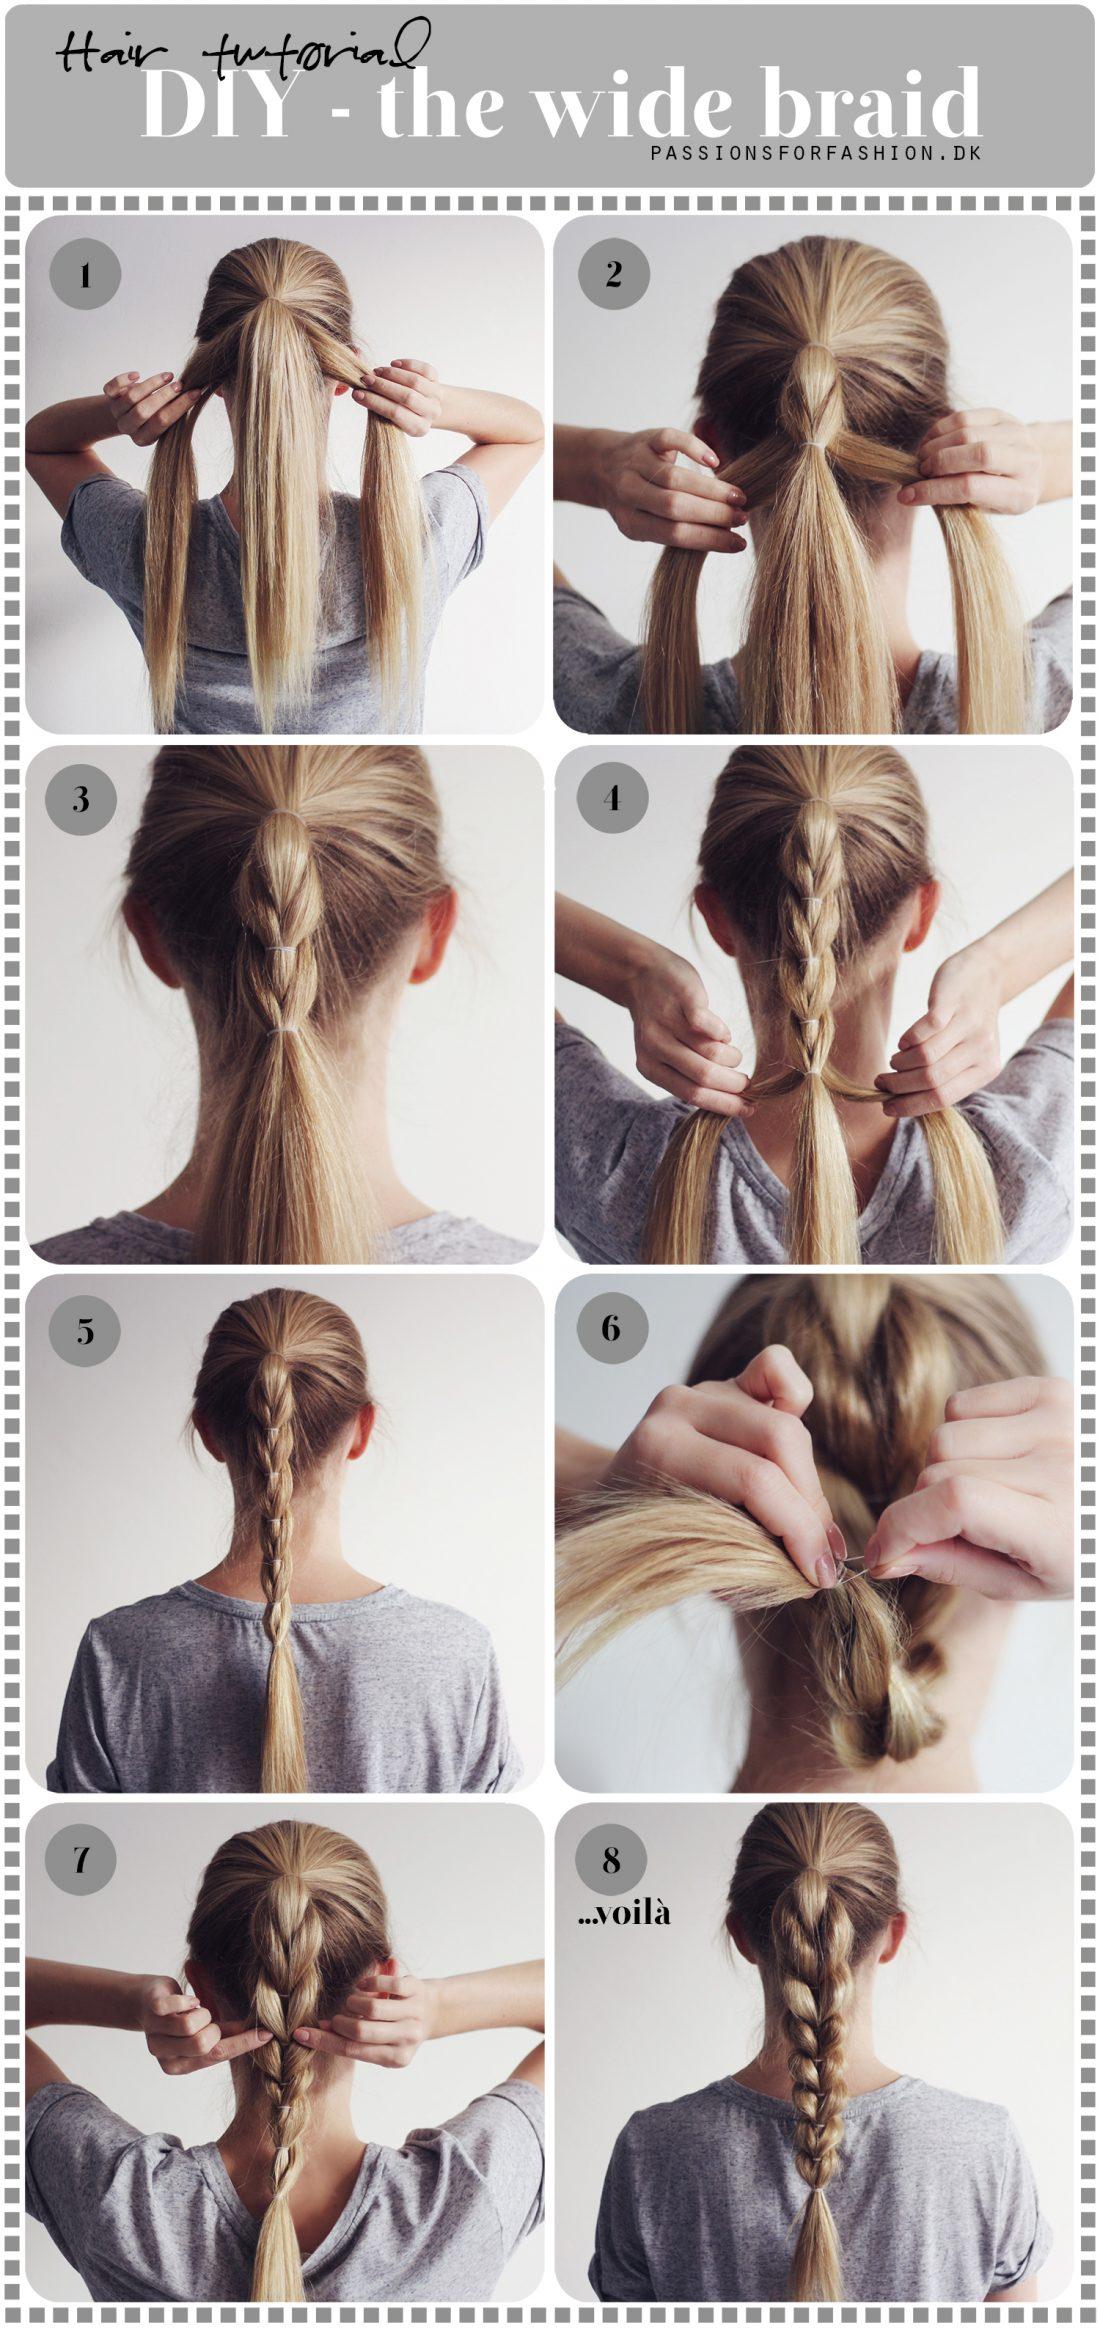 hårguide-frisure-fletning-hair-tutorial@2x1.jpg